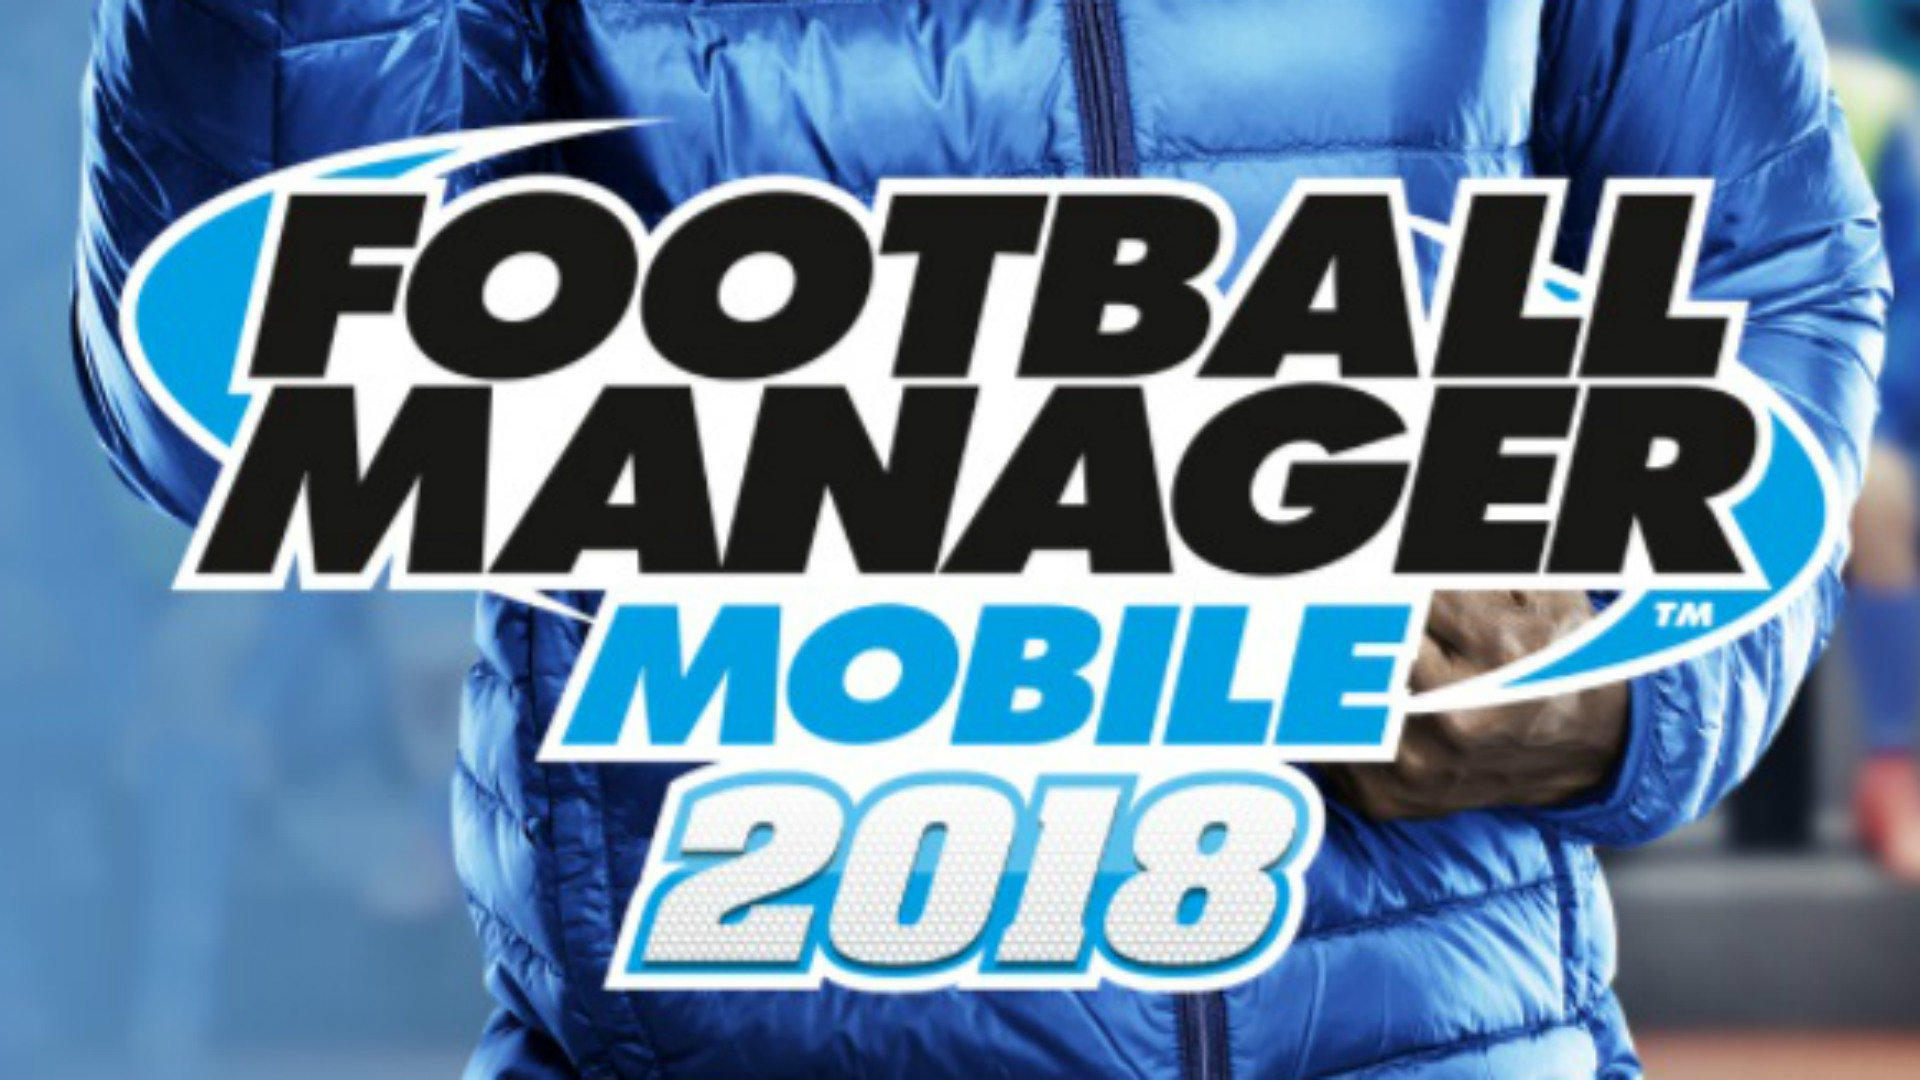 Vyšel mobilní Football Manager Mobile 2018